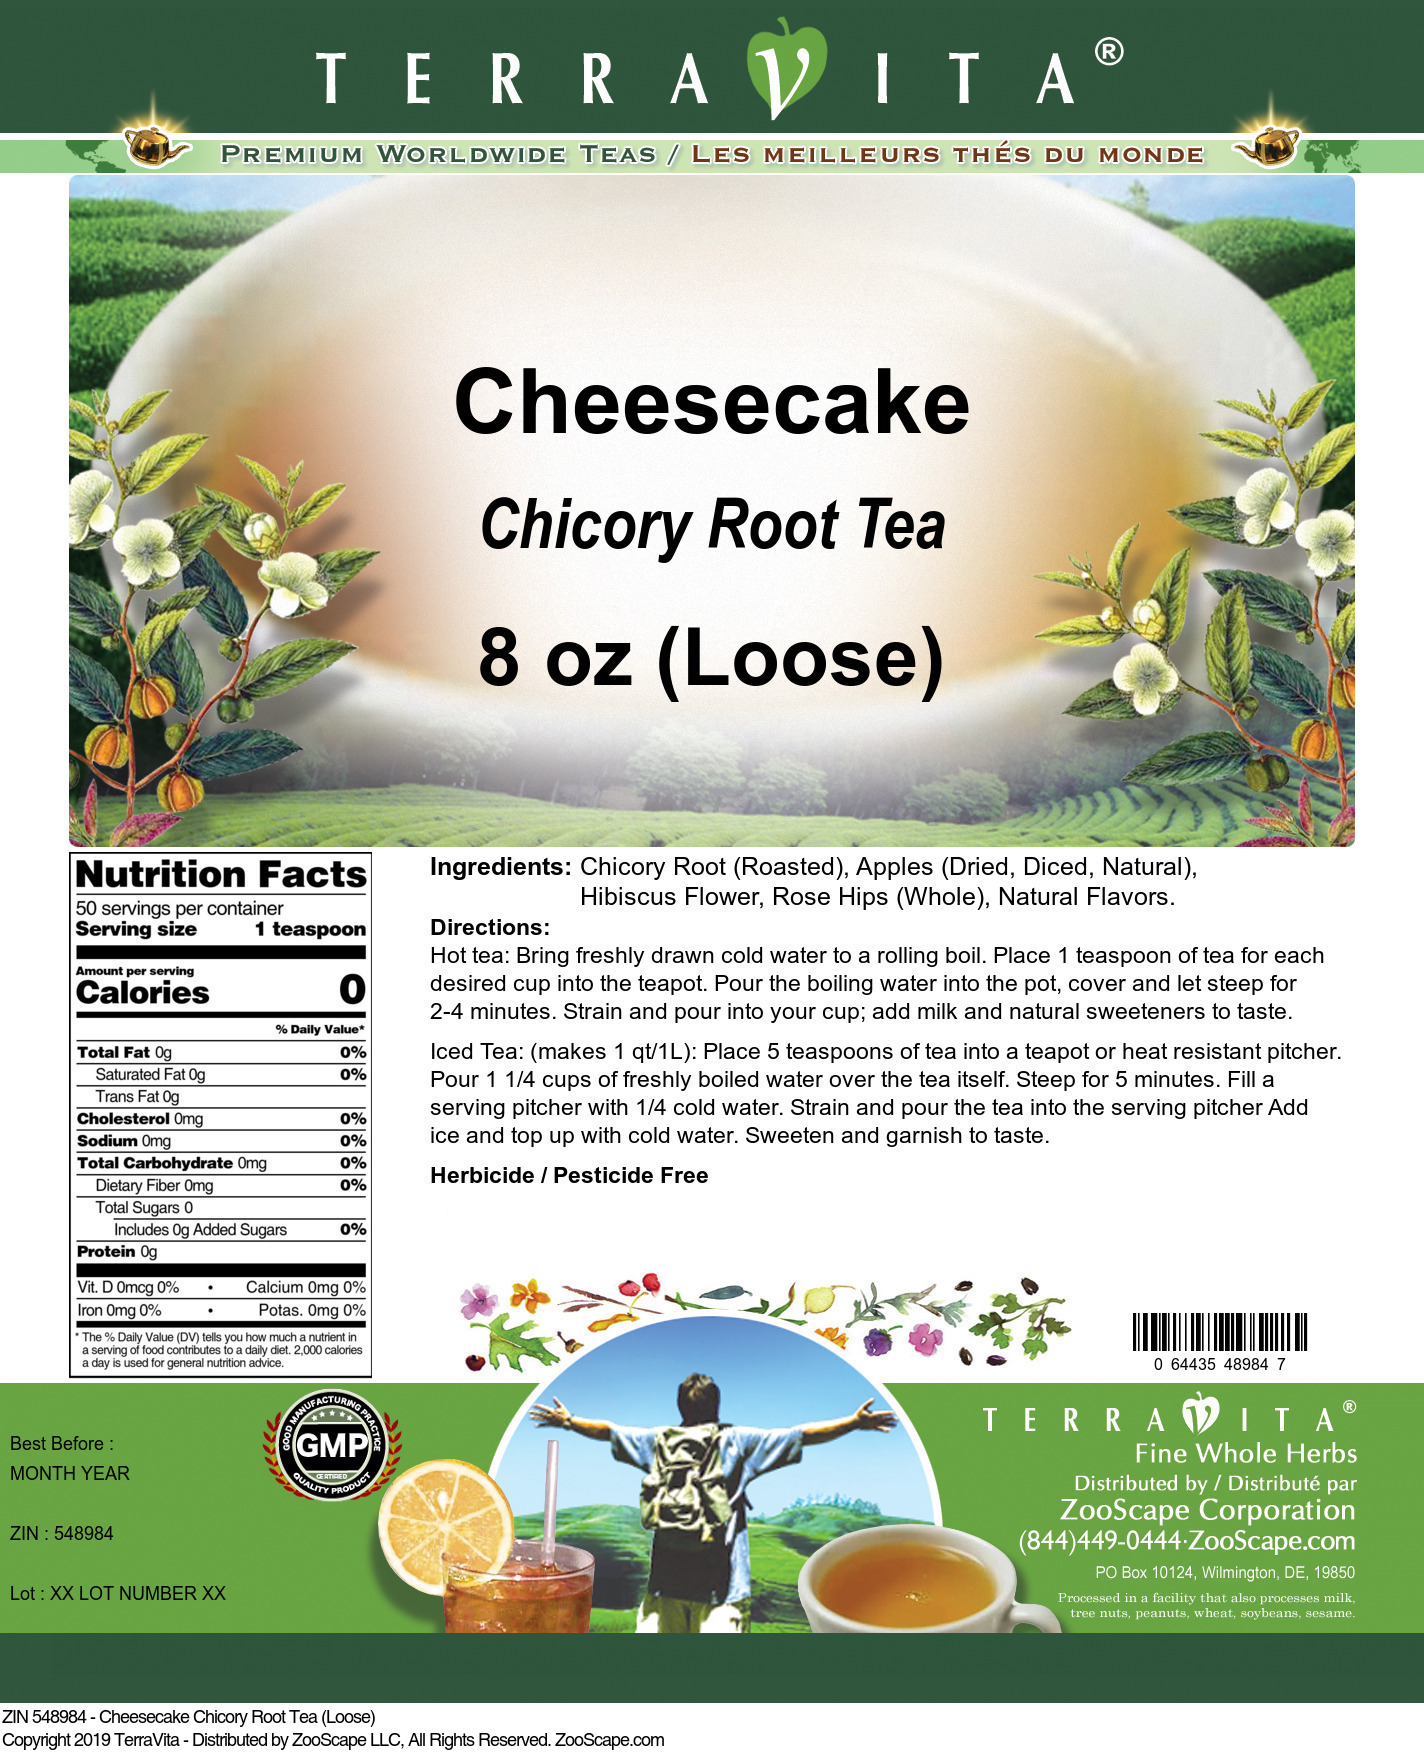 Cheesecake Chicory Root Tea (Loose)